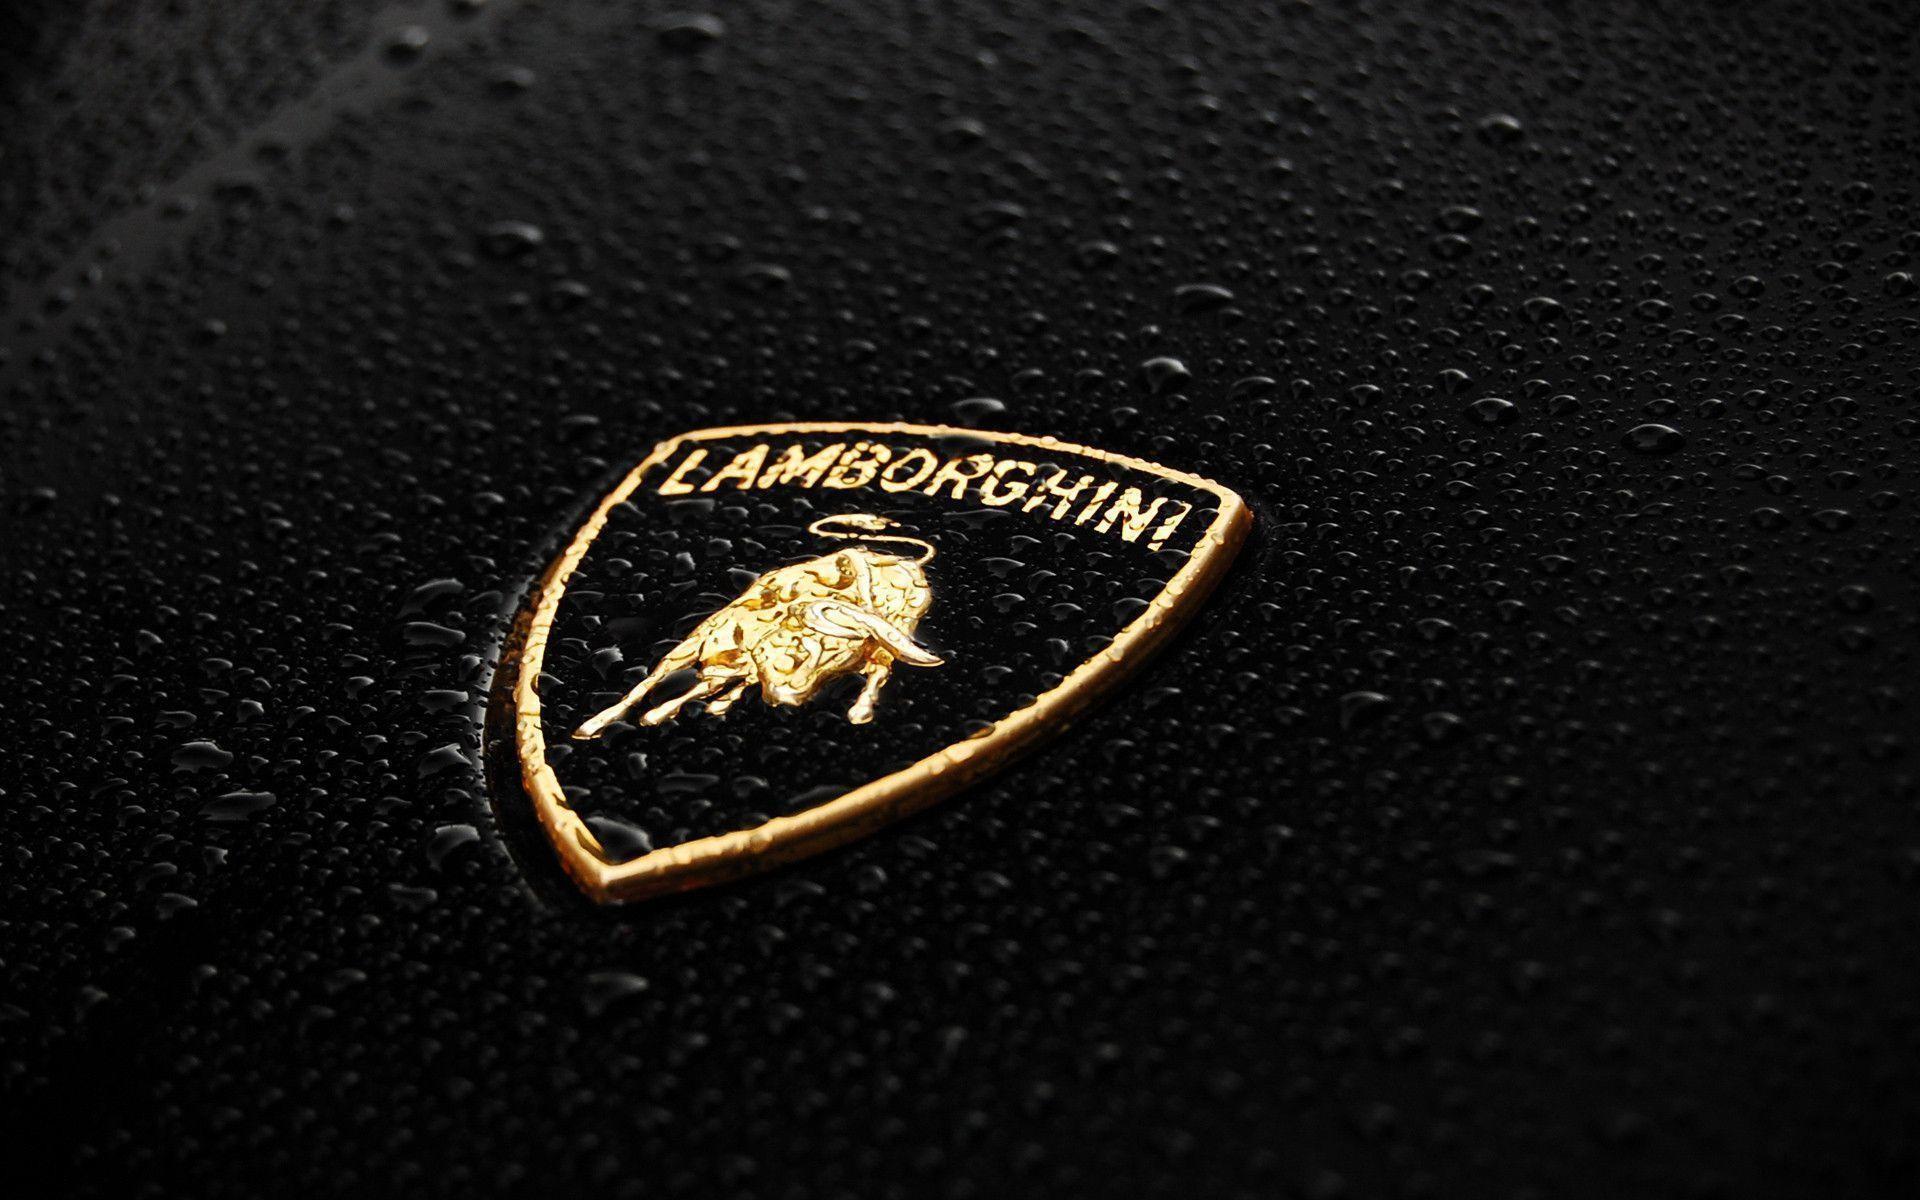 Lamborghini Logo Wallpaper | HD Car Wallpapers